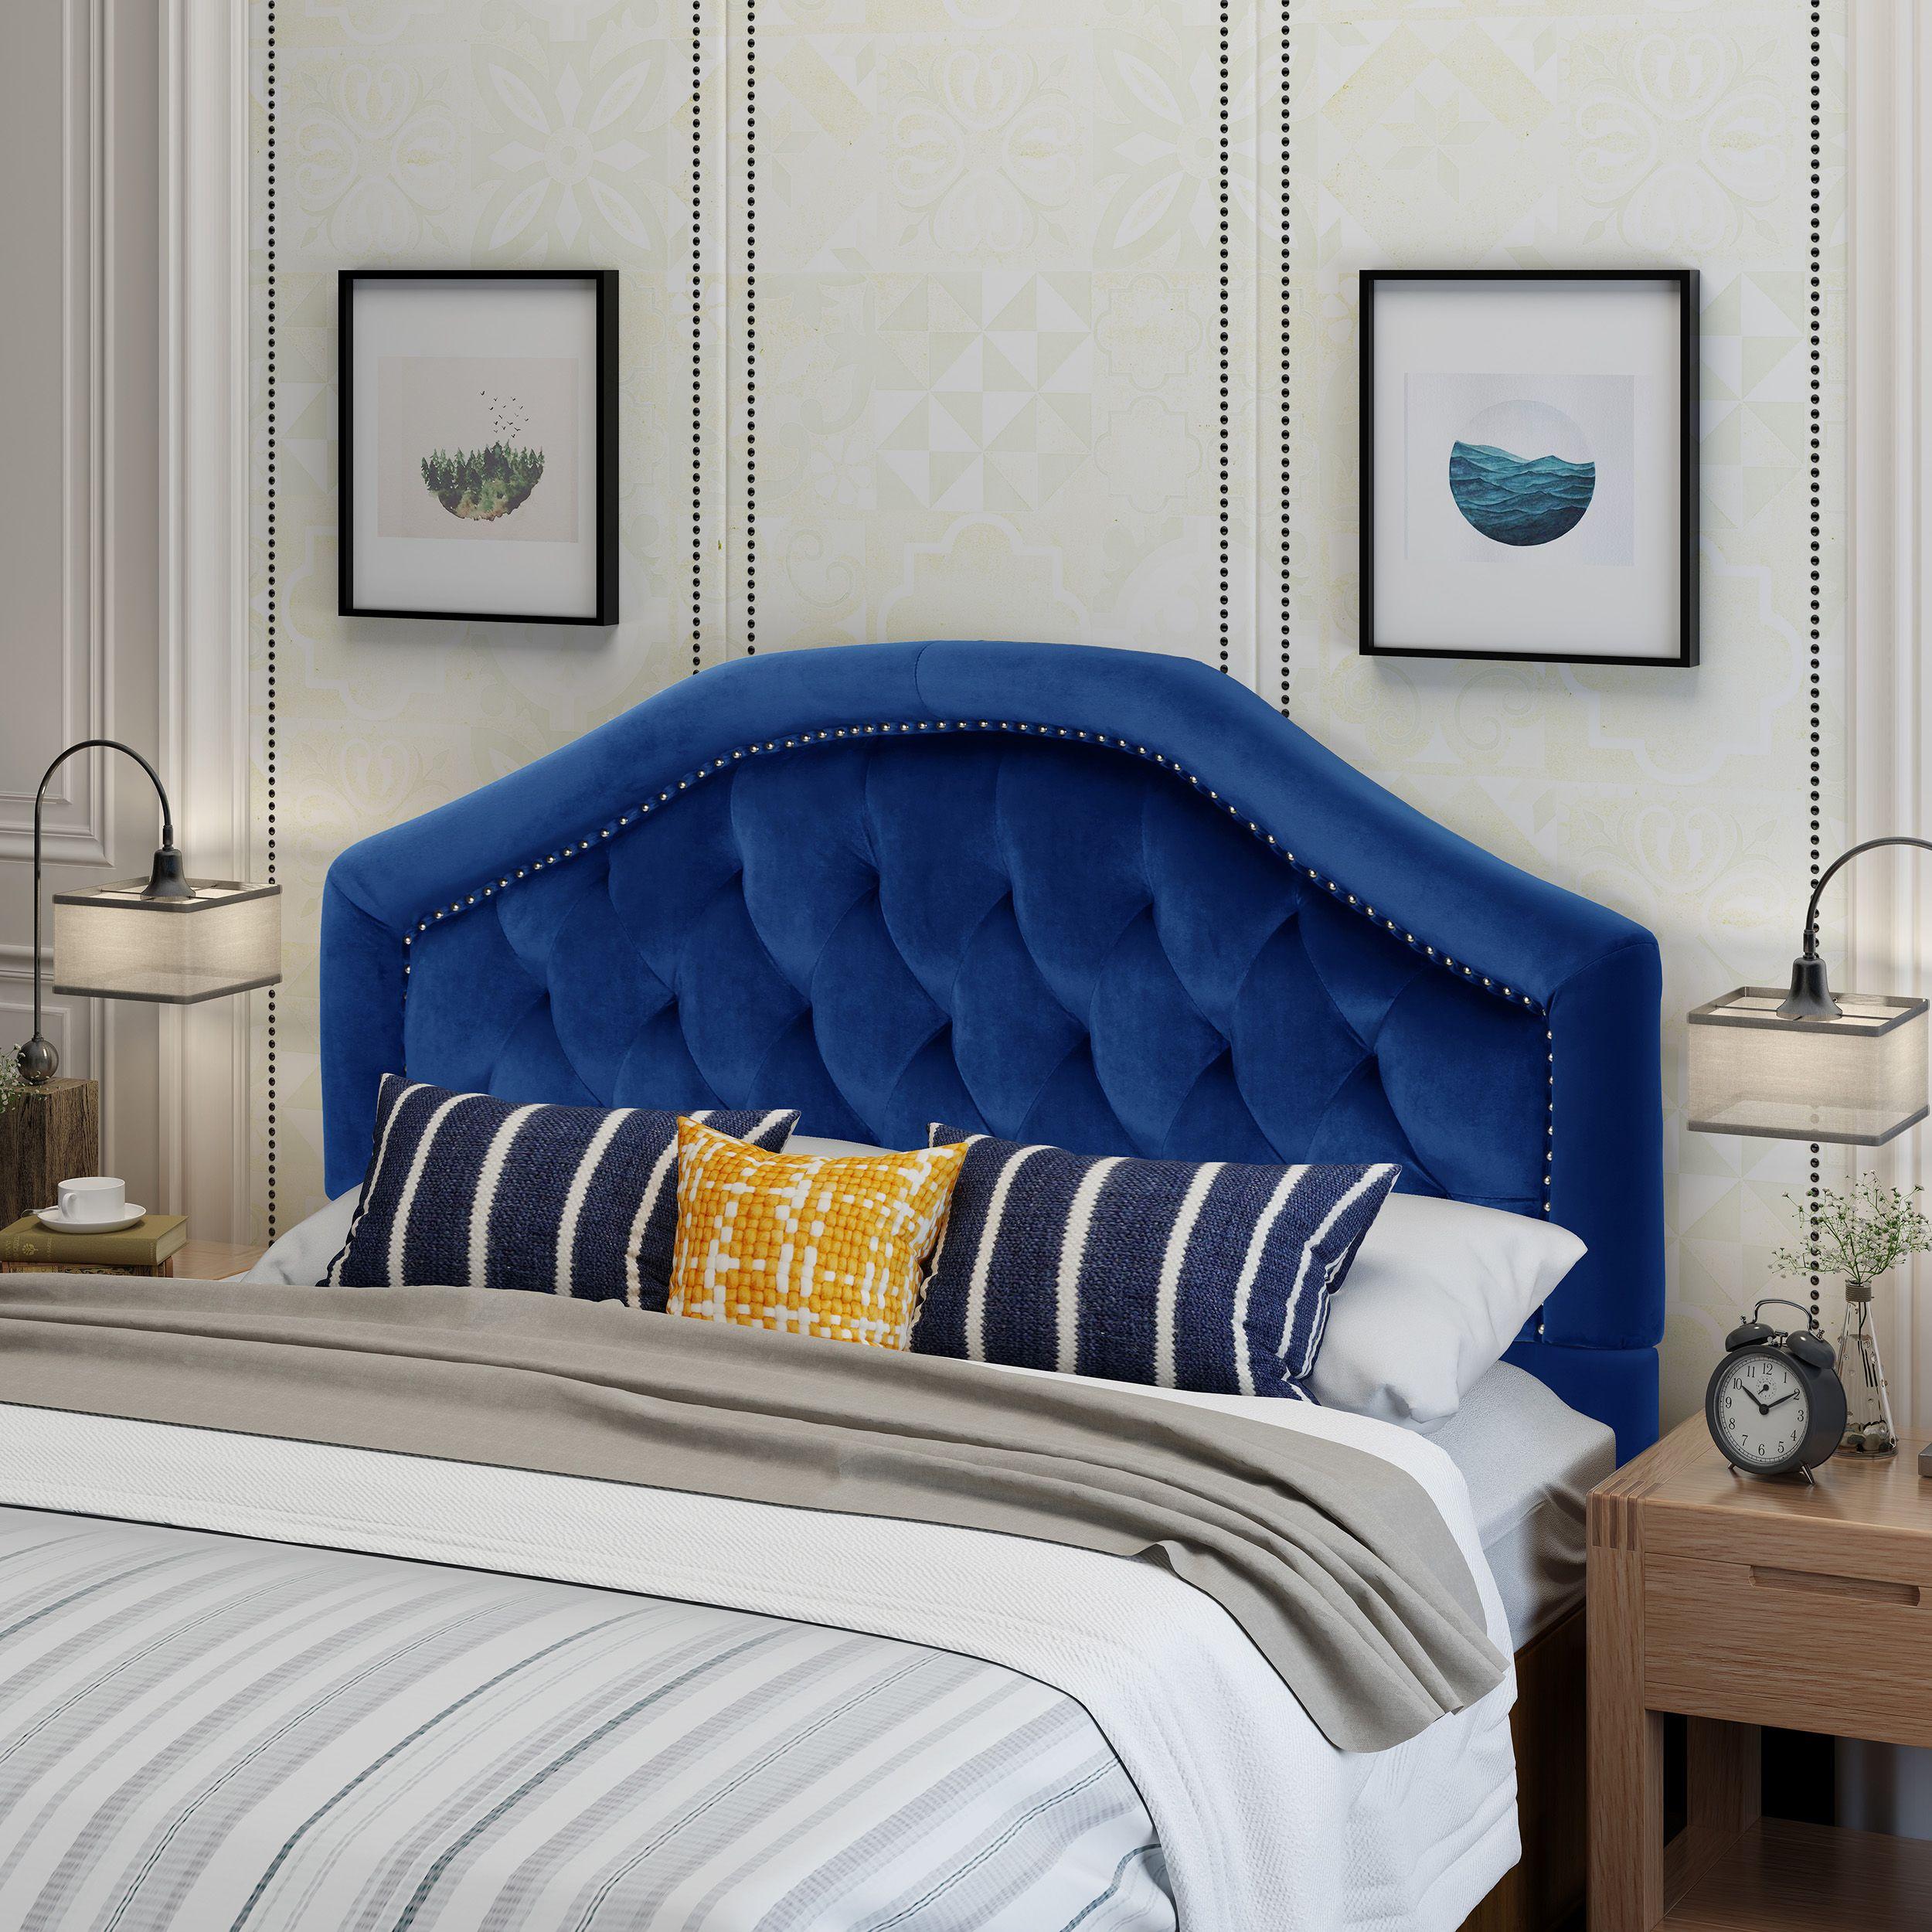 Home Full headboard, Black headboard, Headboards for beds